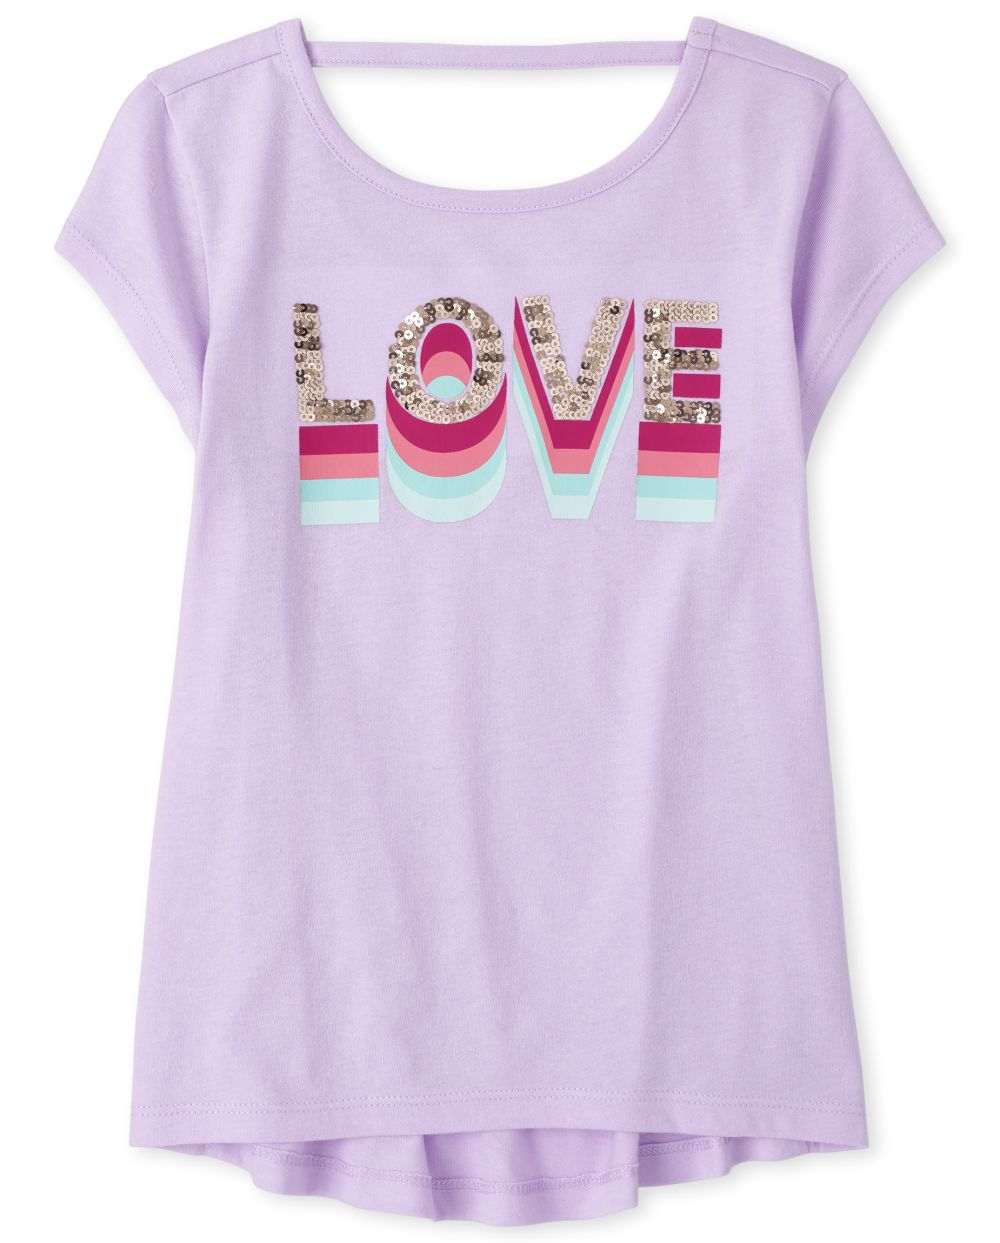 Girls Short Sleeve Sequin 'Love' Cut Out Top